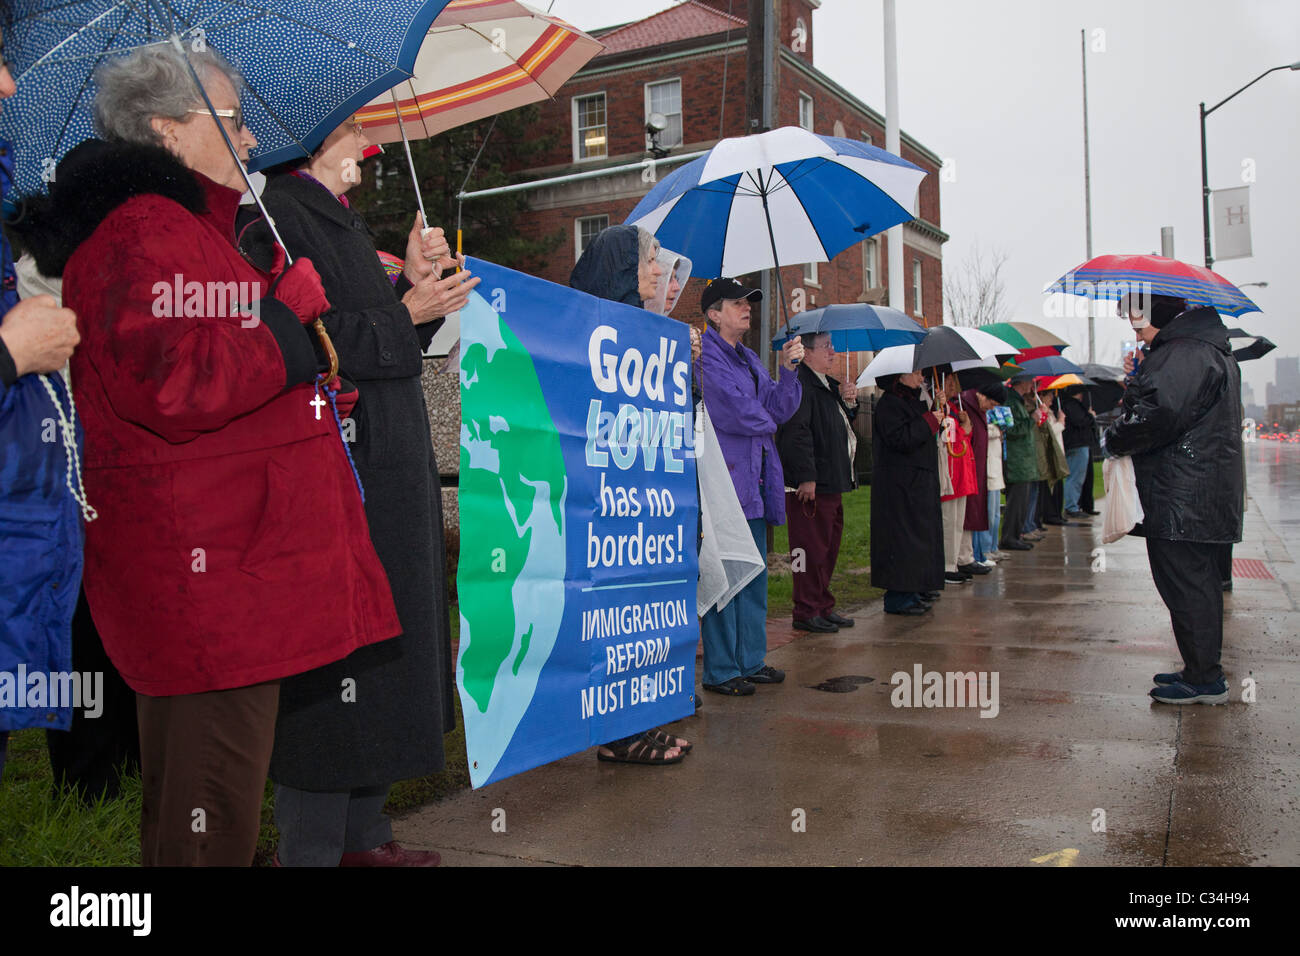 Prayer Vigil for Immigration Reform - Stock Image